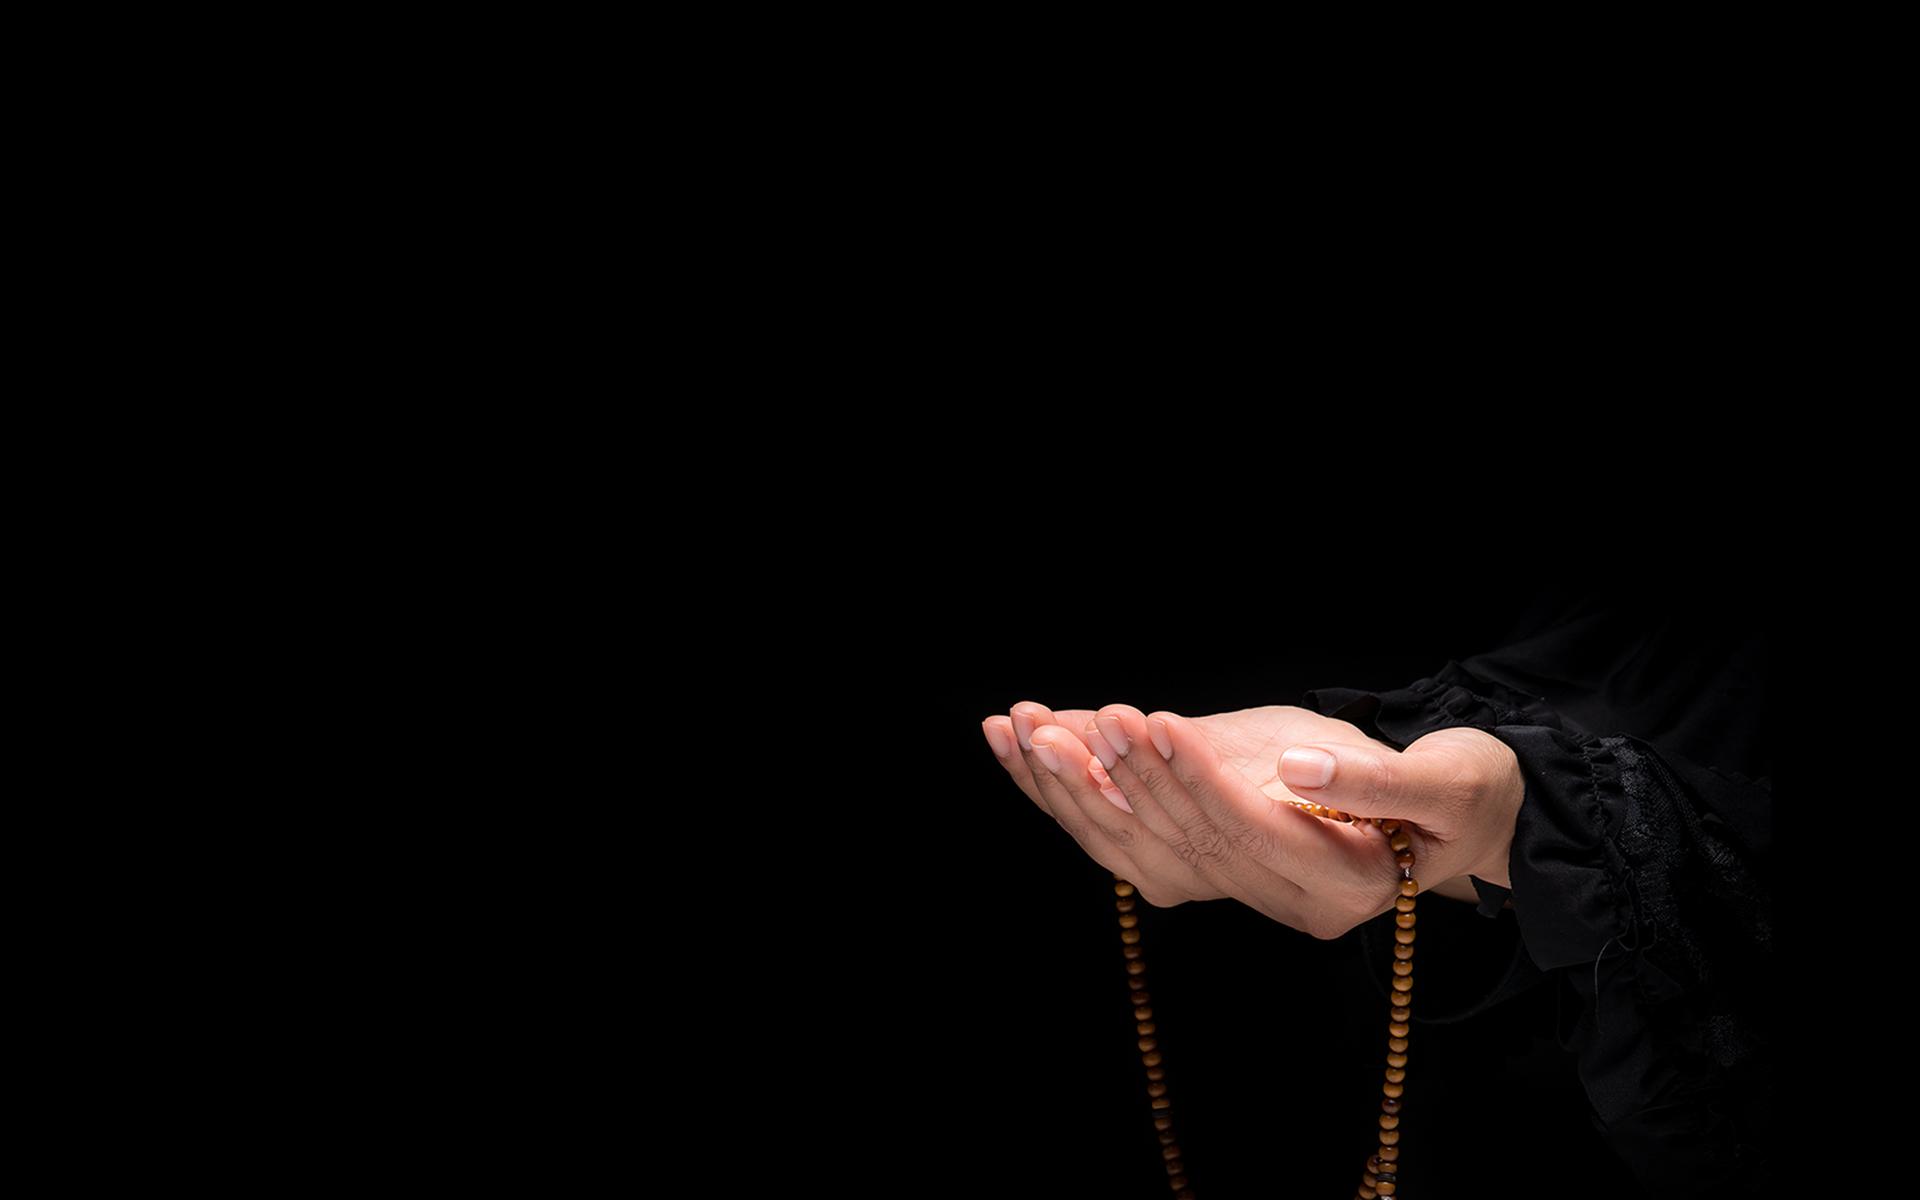 science et conscience ... chaine islamique sunnite